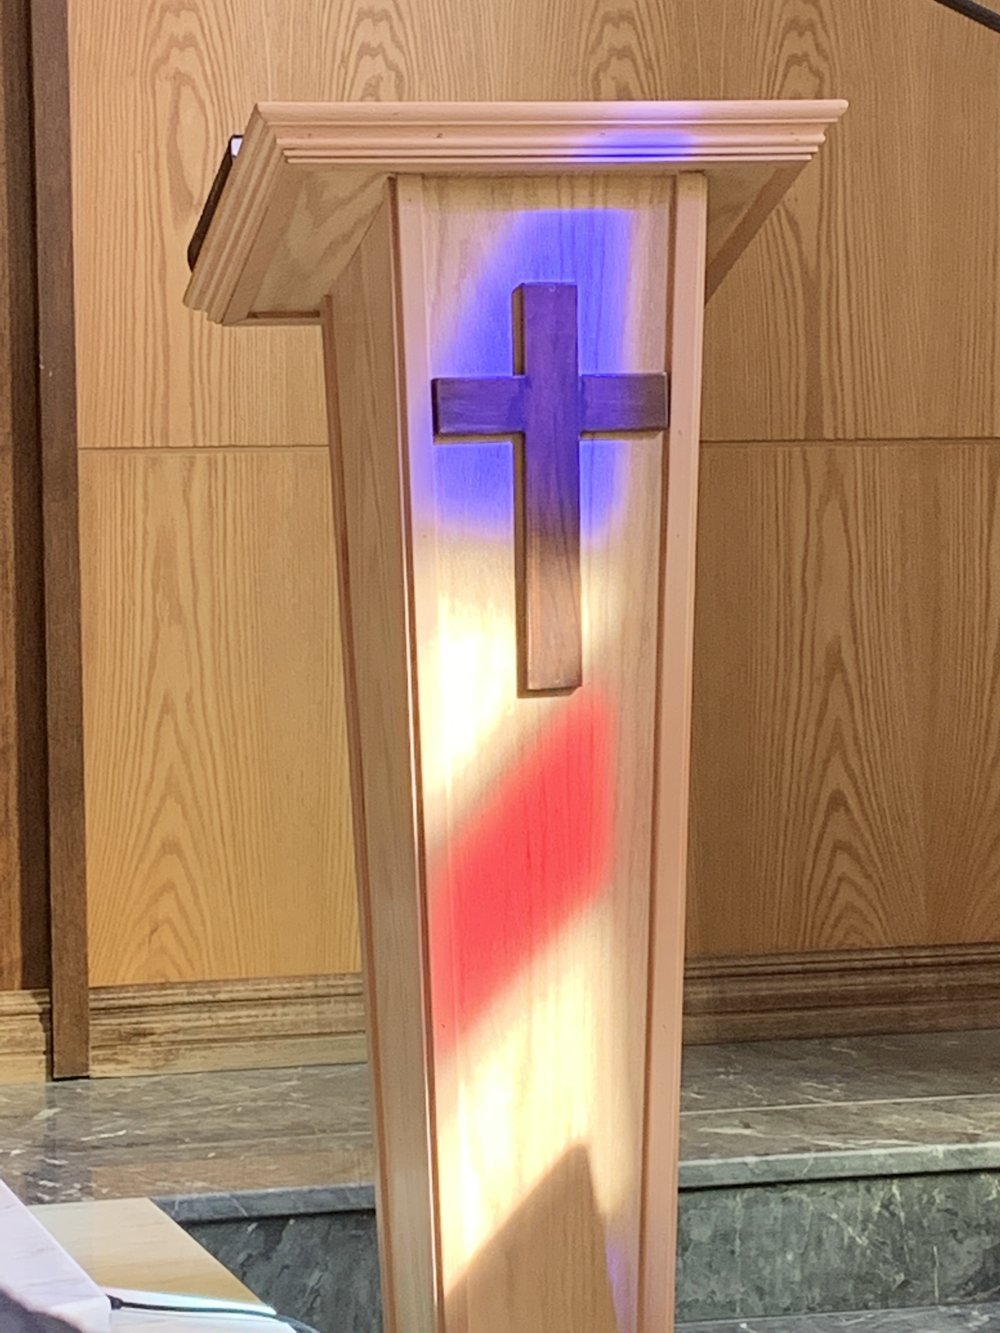 The light illuminates the pulpit to illustrate Rob's message